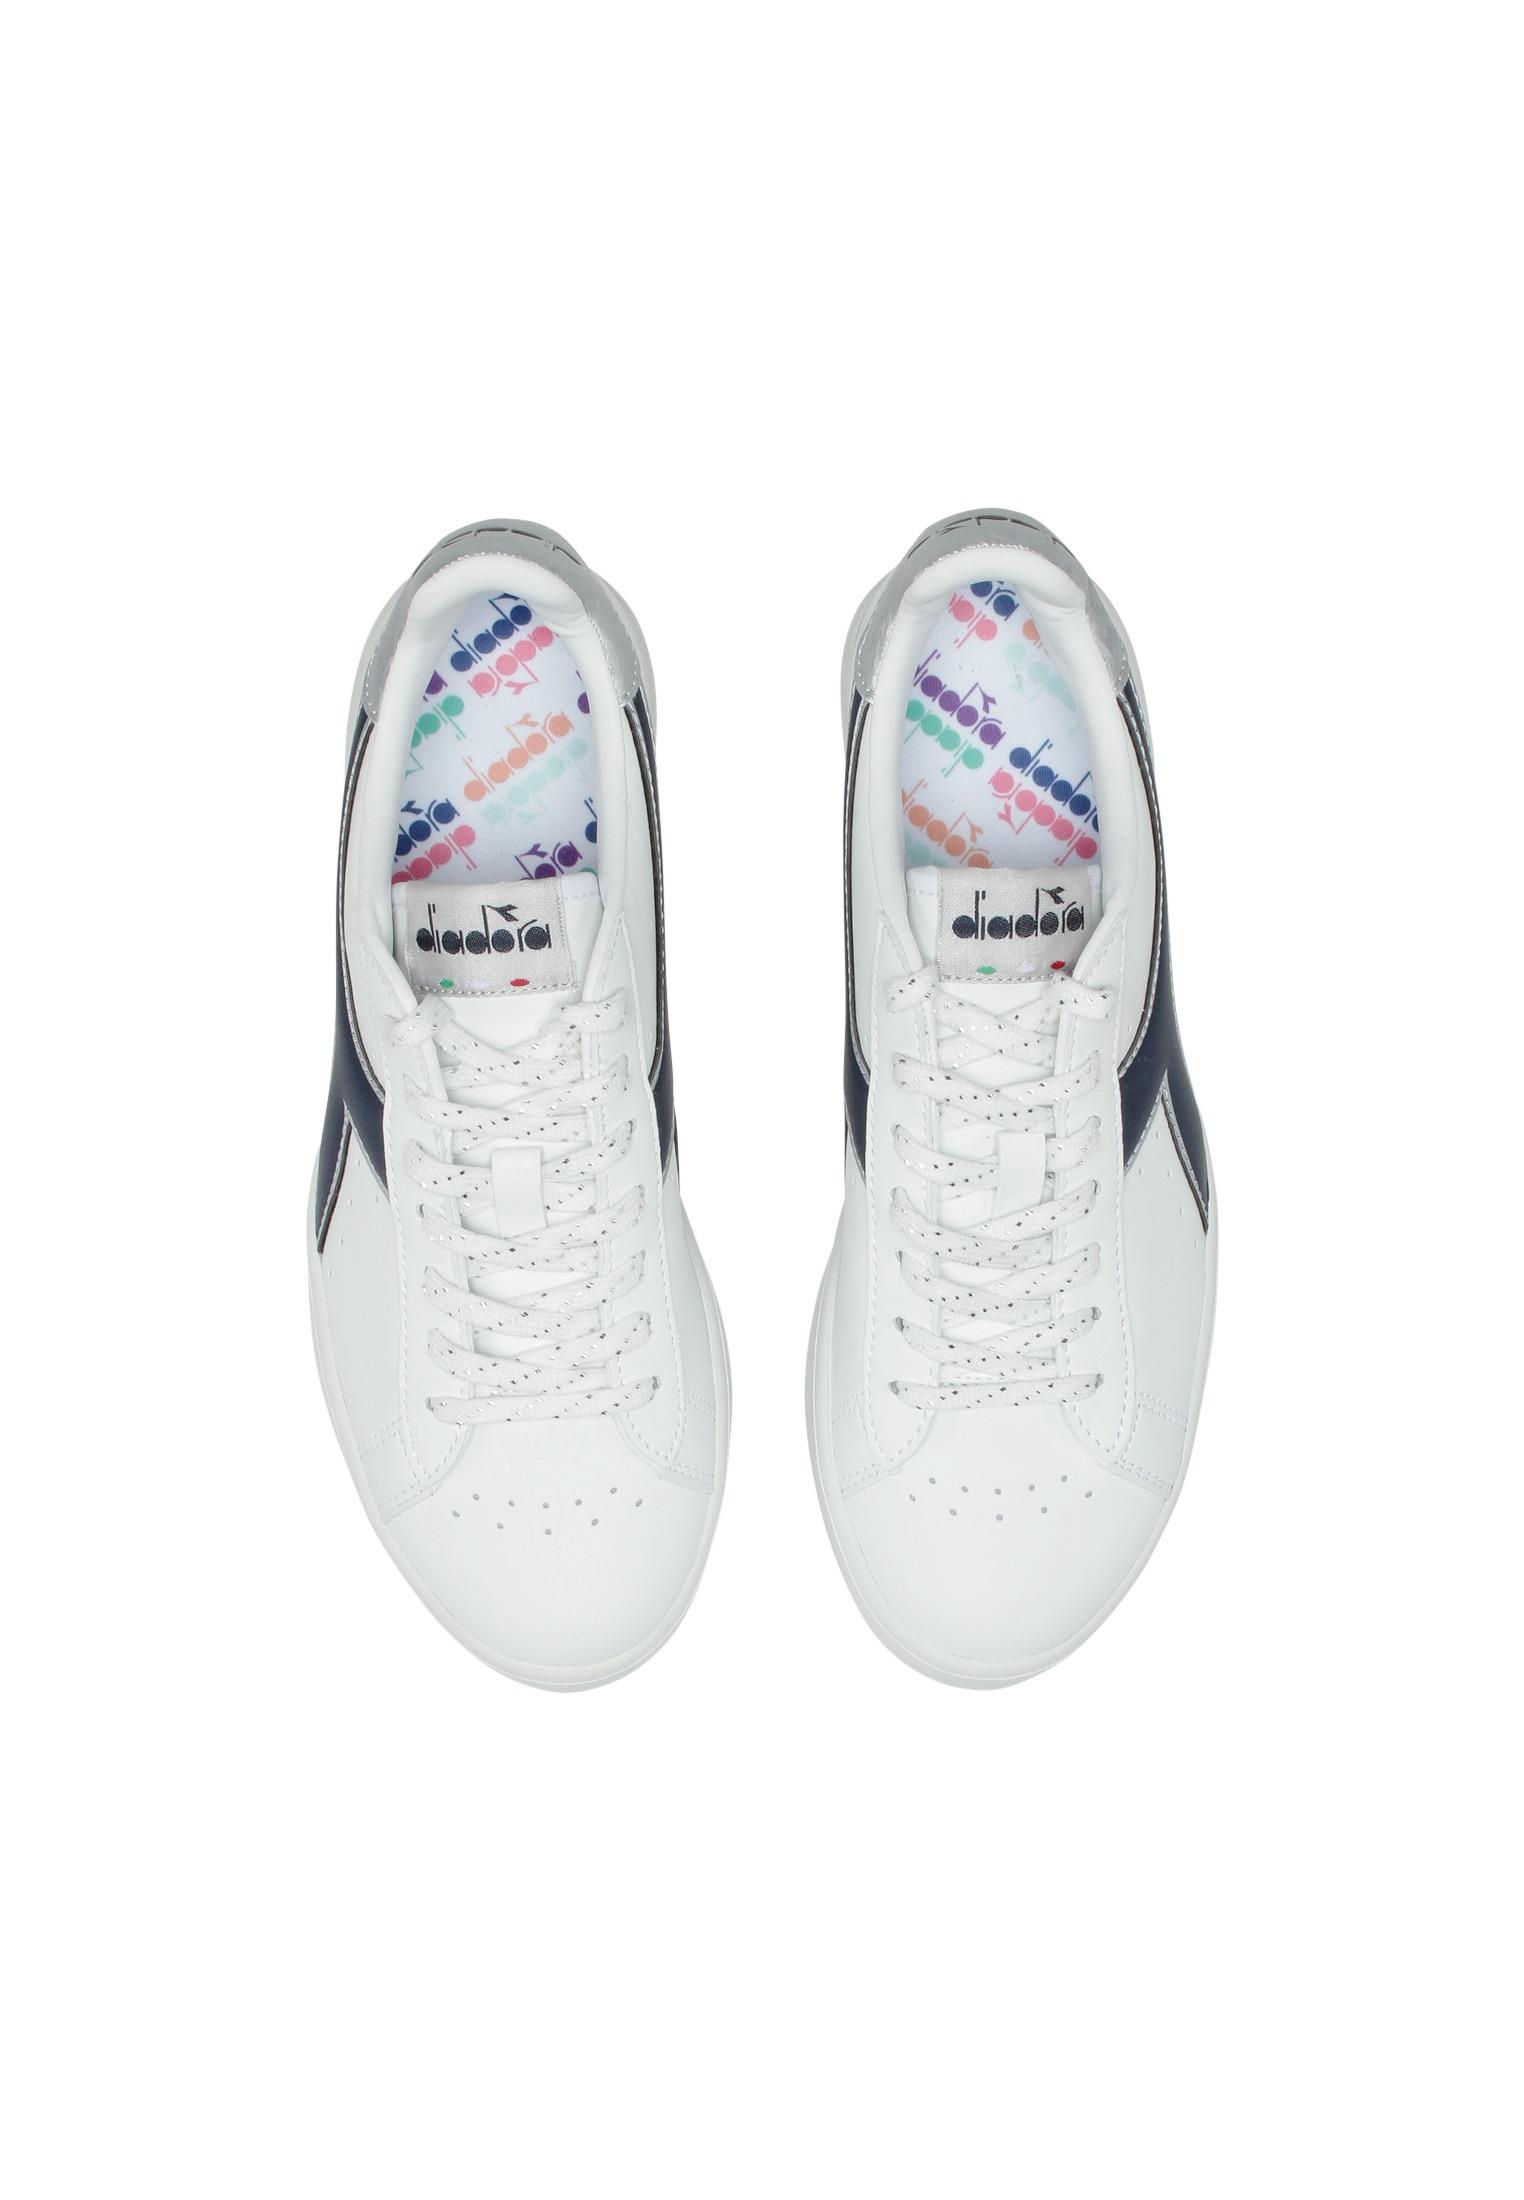 Diadora-Sneakers-GAME-P-WN-para-hombre-y-mujer miniatura 30